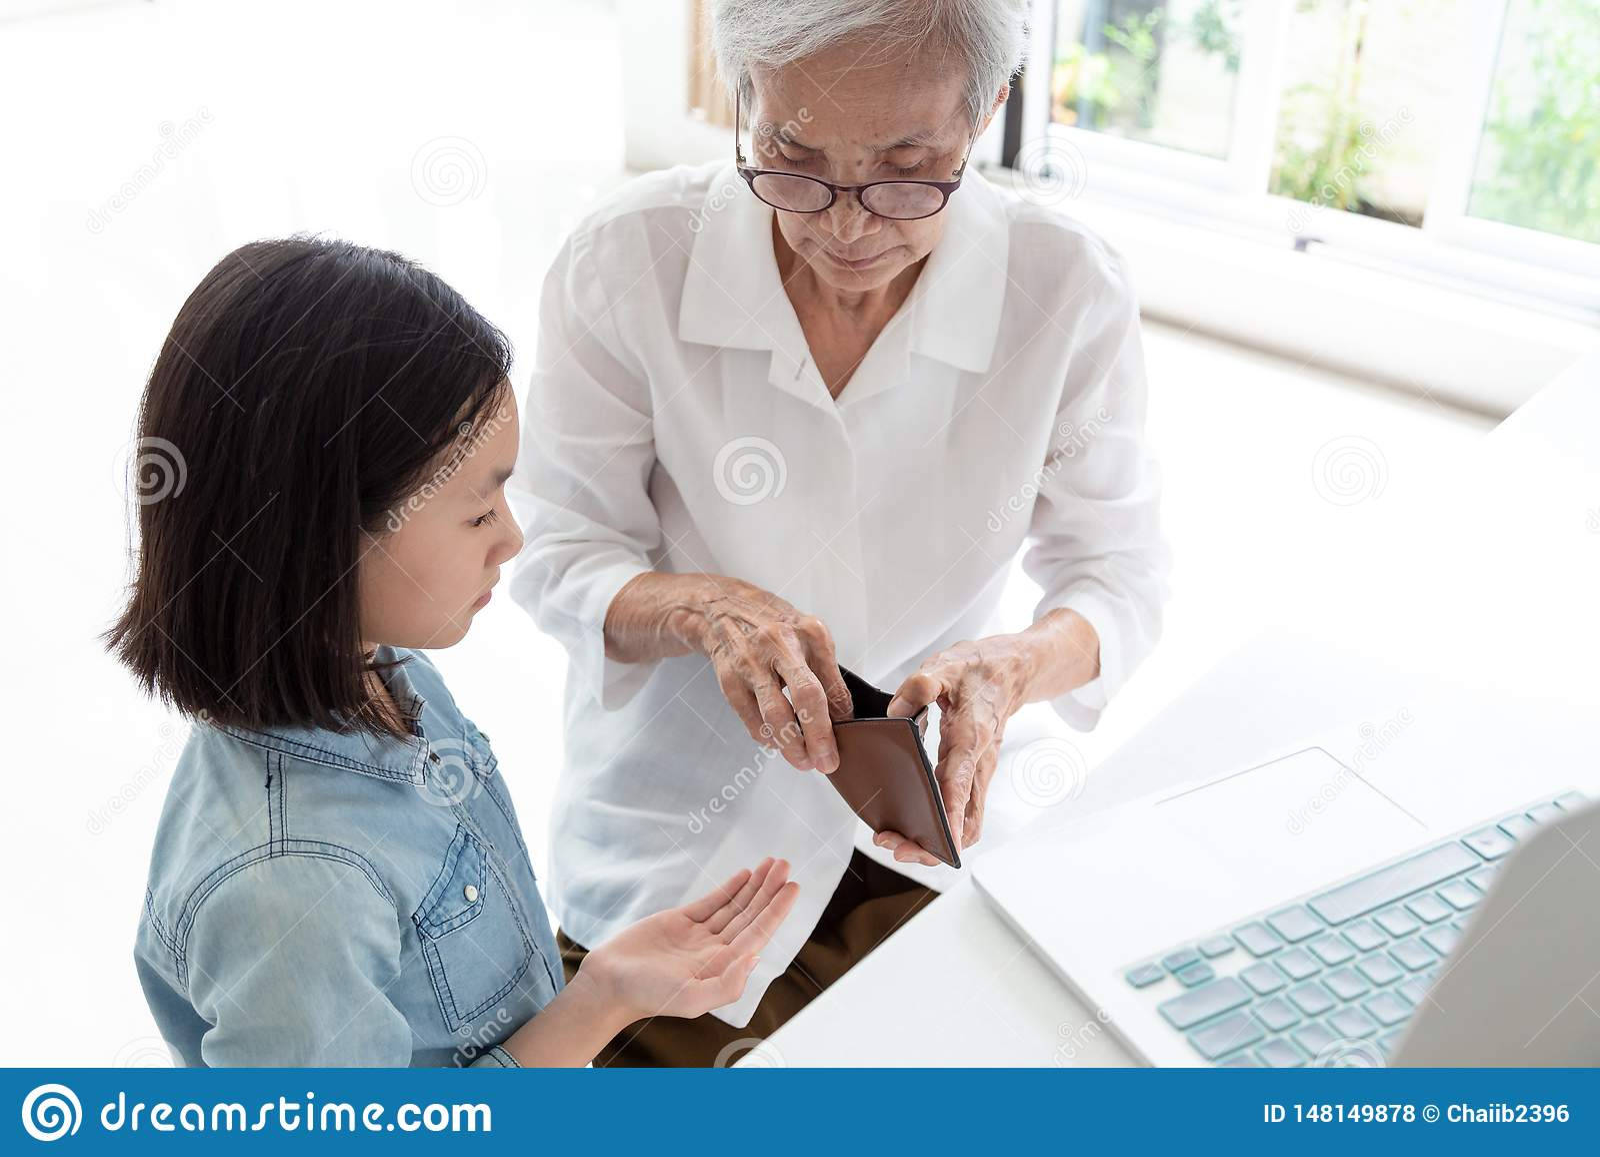 Closeup elderly woman hands open wallet,grandmother or guardian giving pocket money to granddaughter,asian little girl demanding